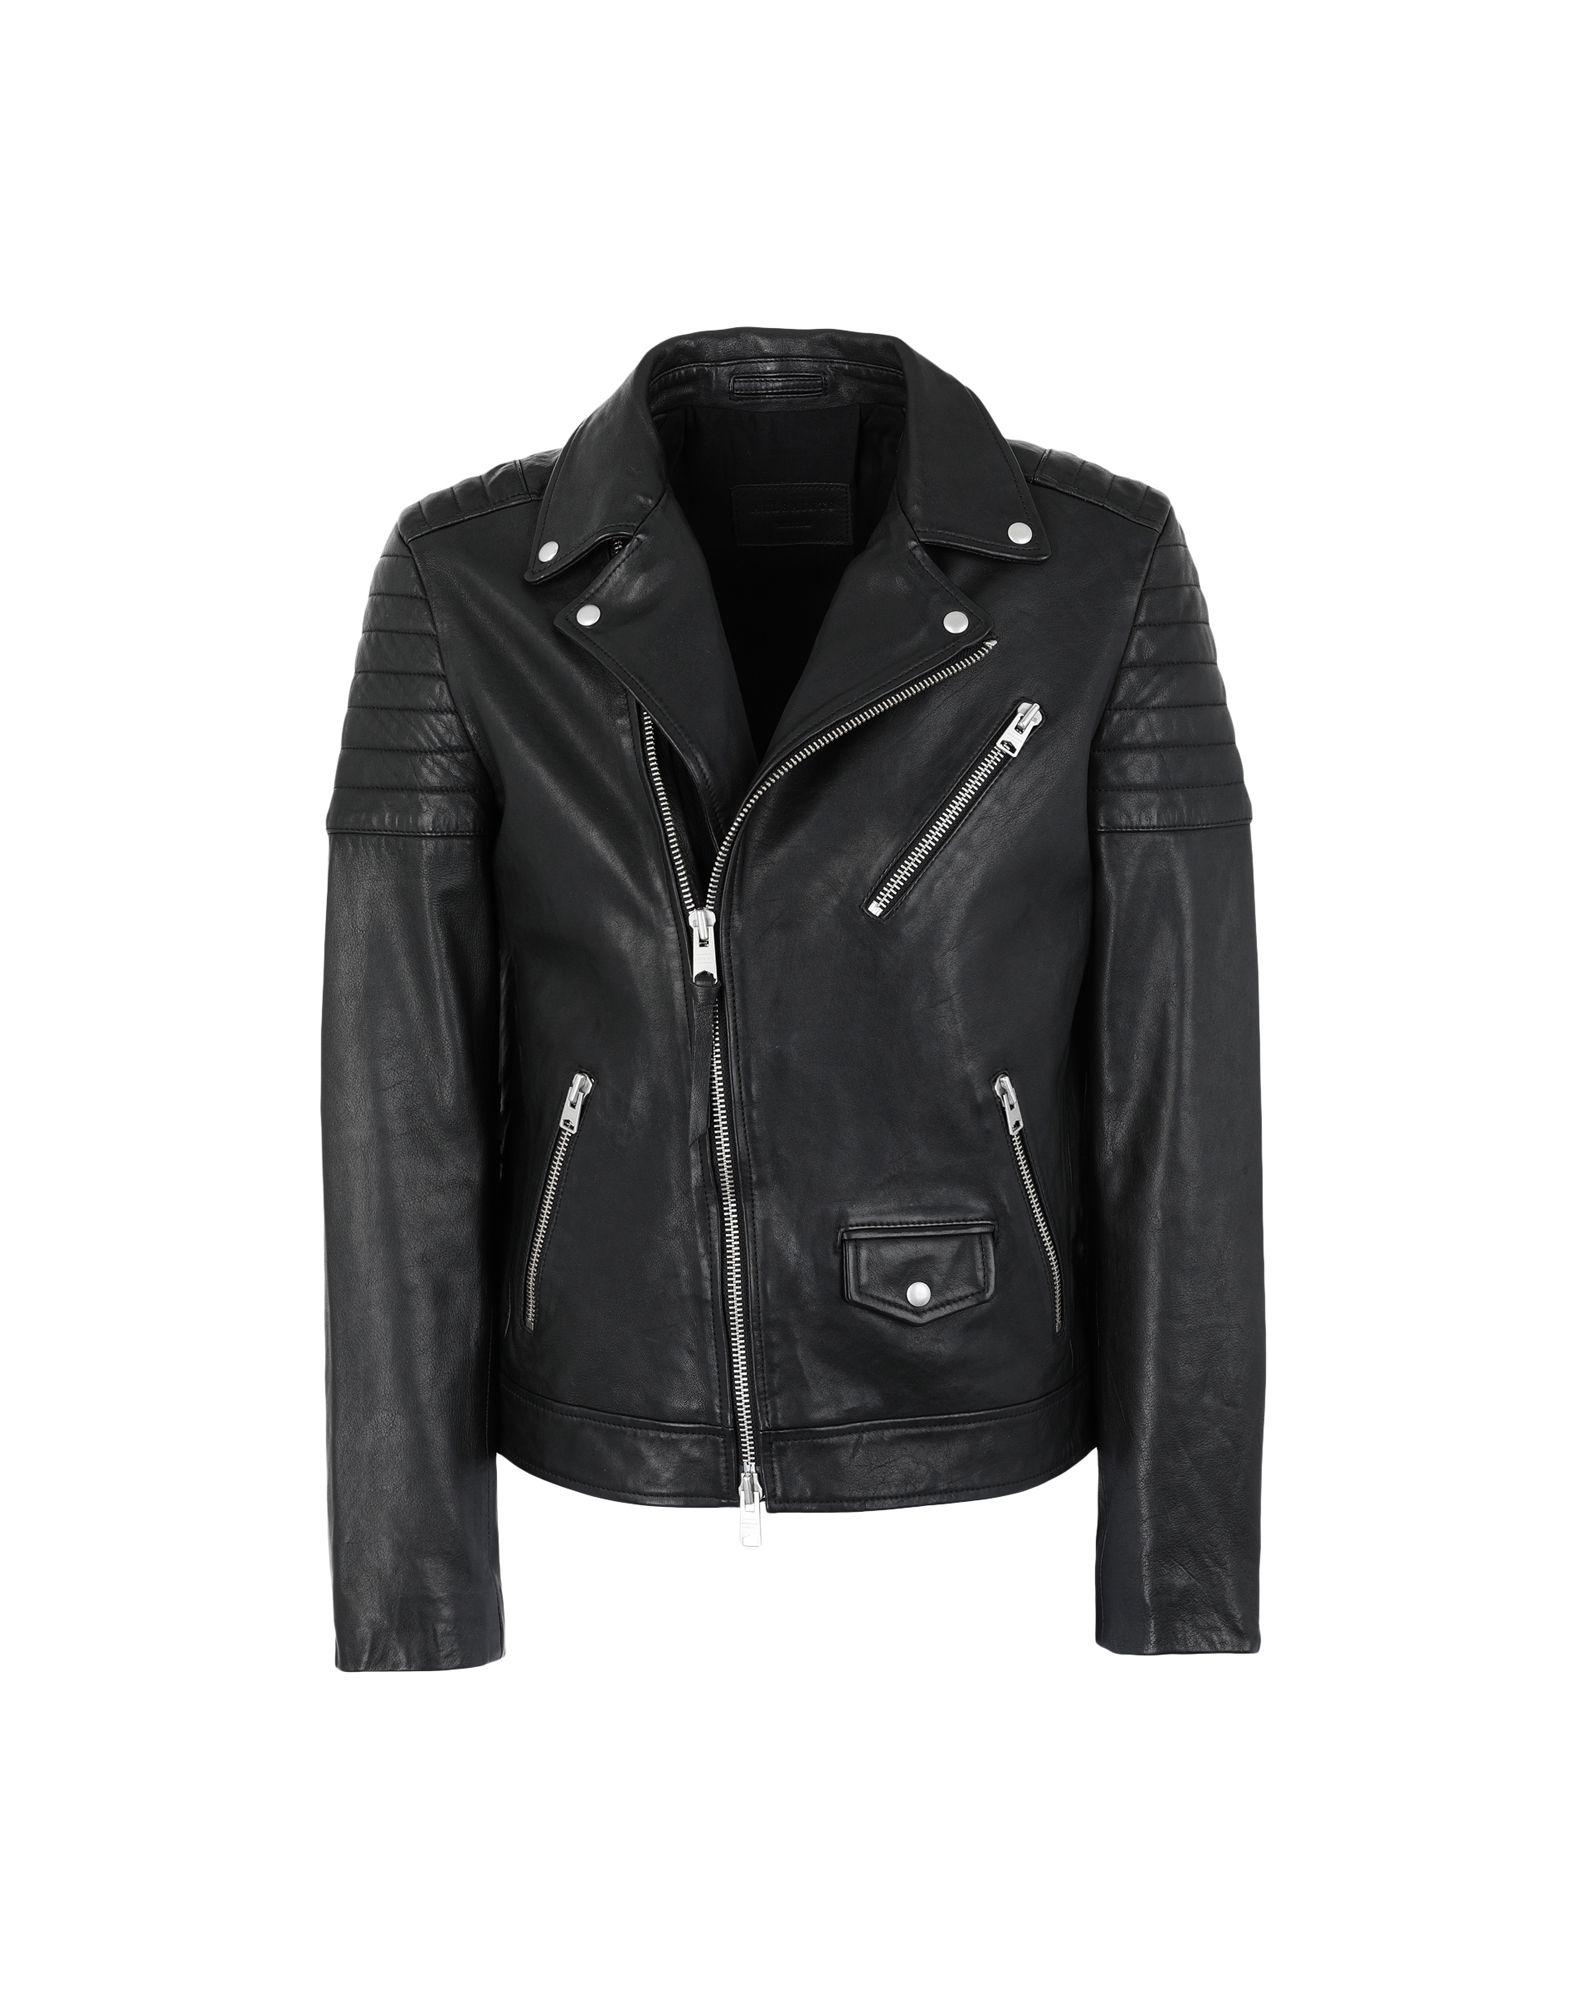 e99d4c03f1c Allsaints Leo Biker - Biker Jacket - Men Allsaints Biker Jackets ...